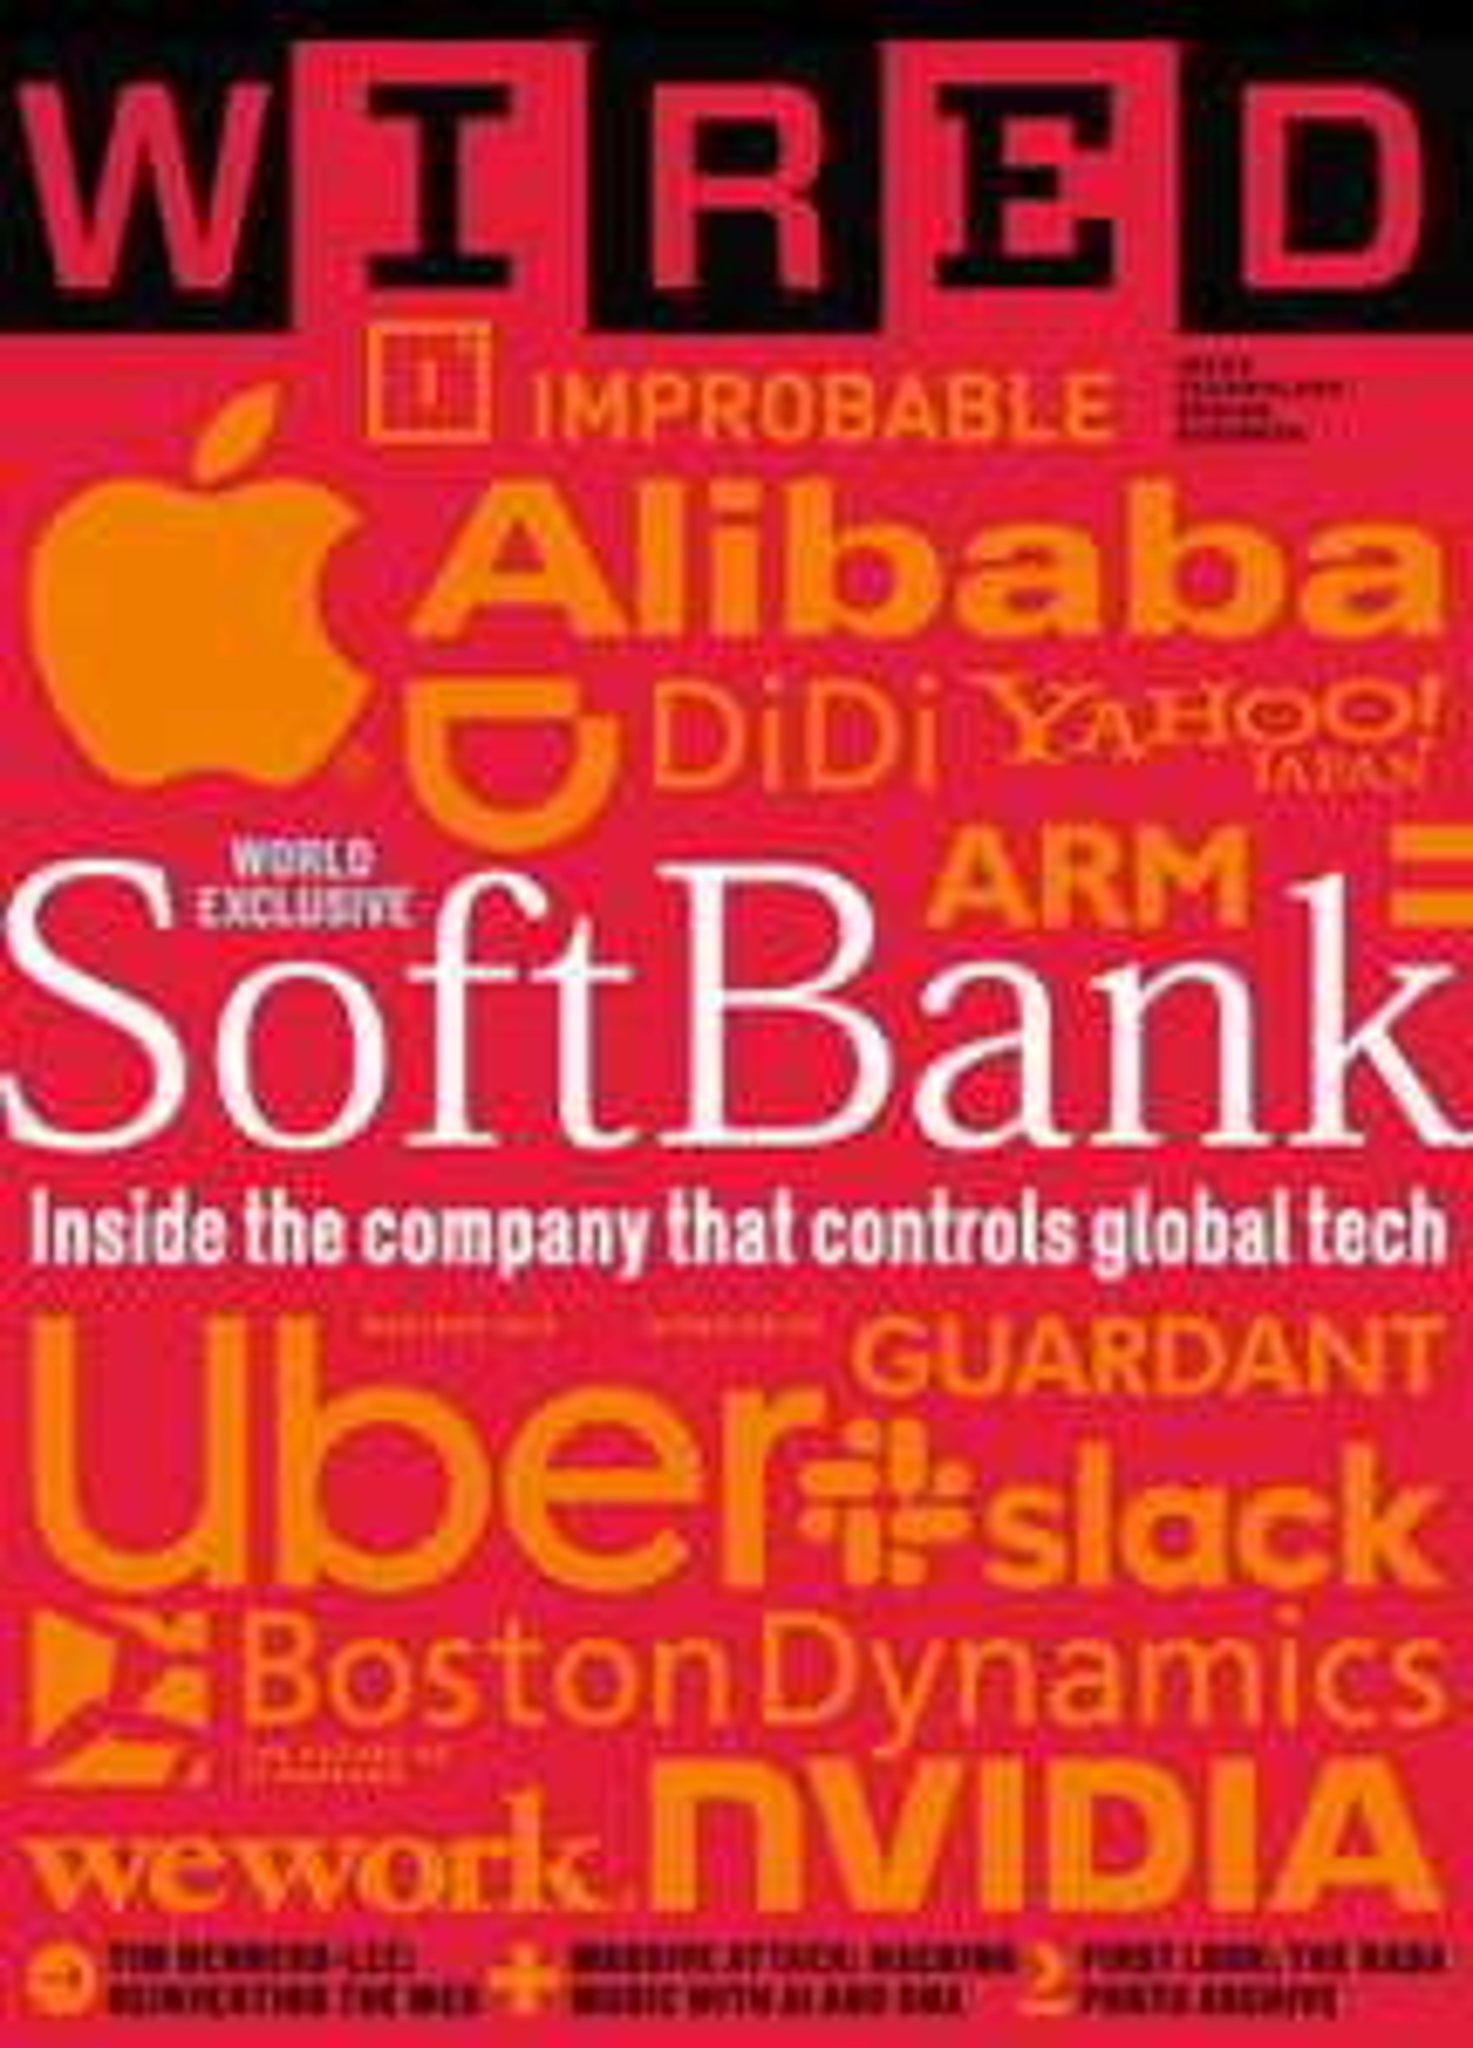 Wired Magazine 1yr Subscription - Print & Digital - £9 @ Magazine Boutique